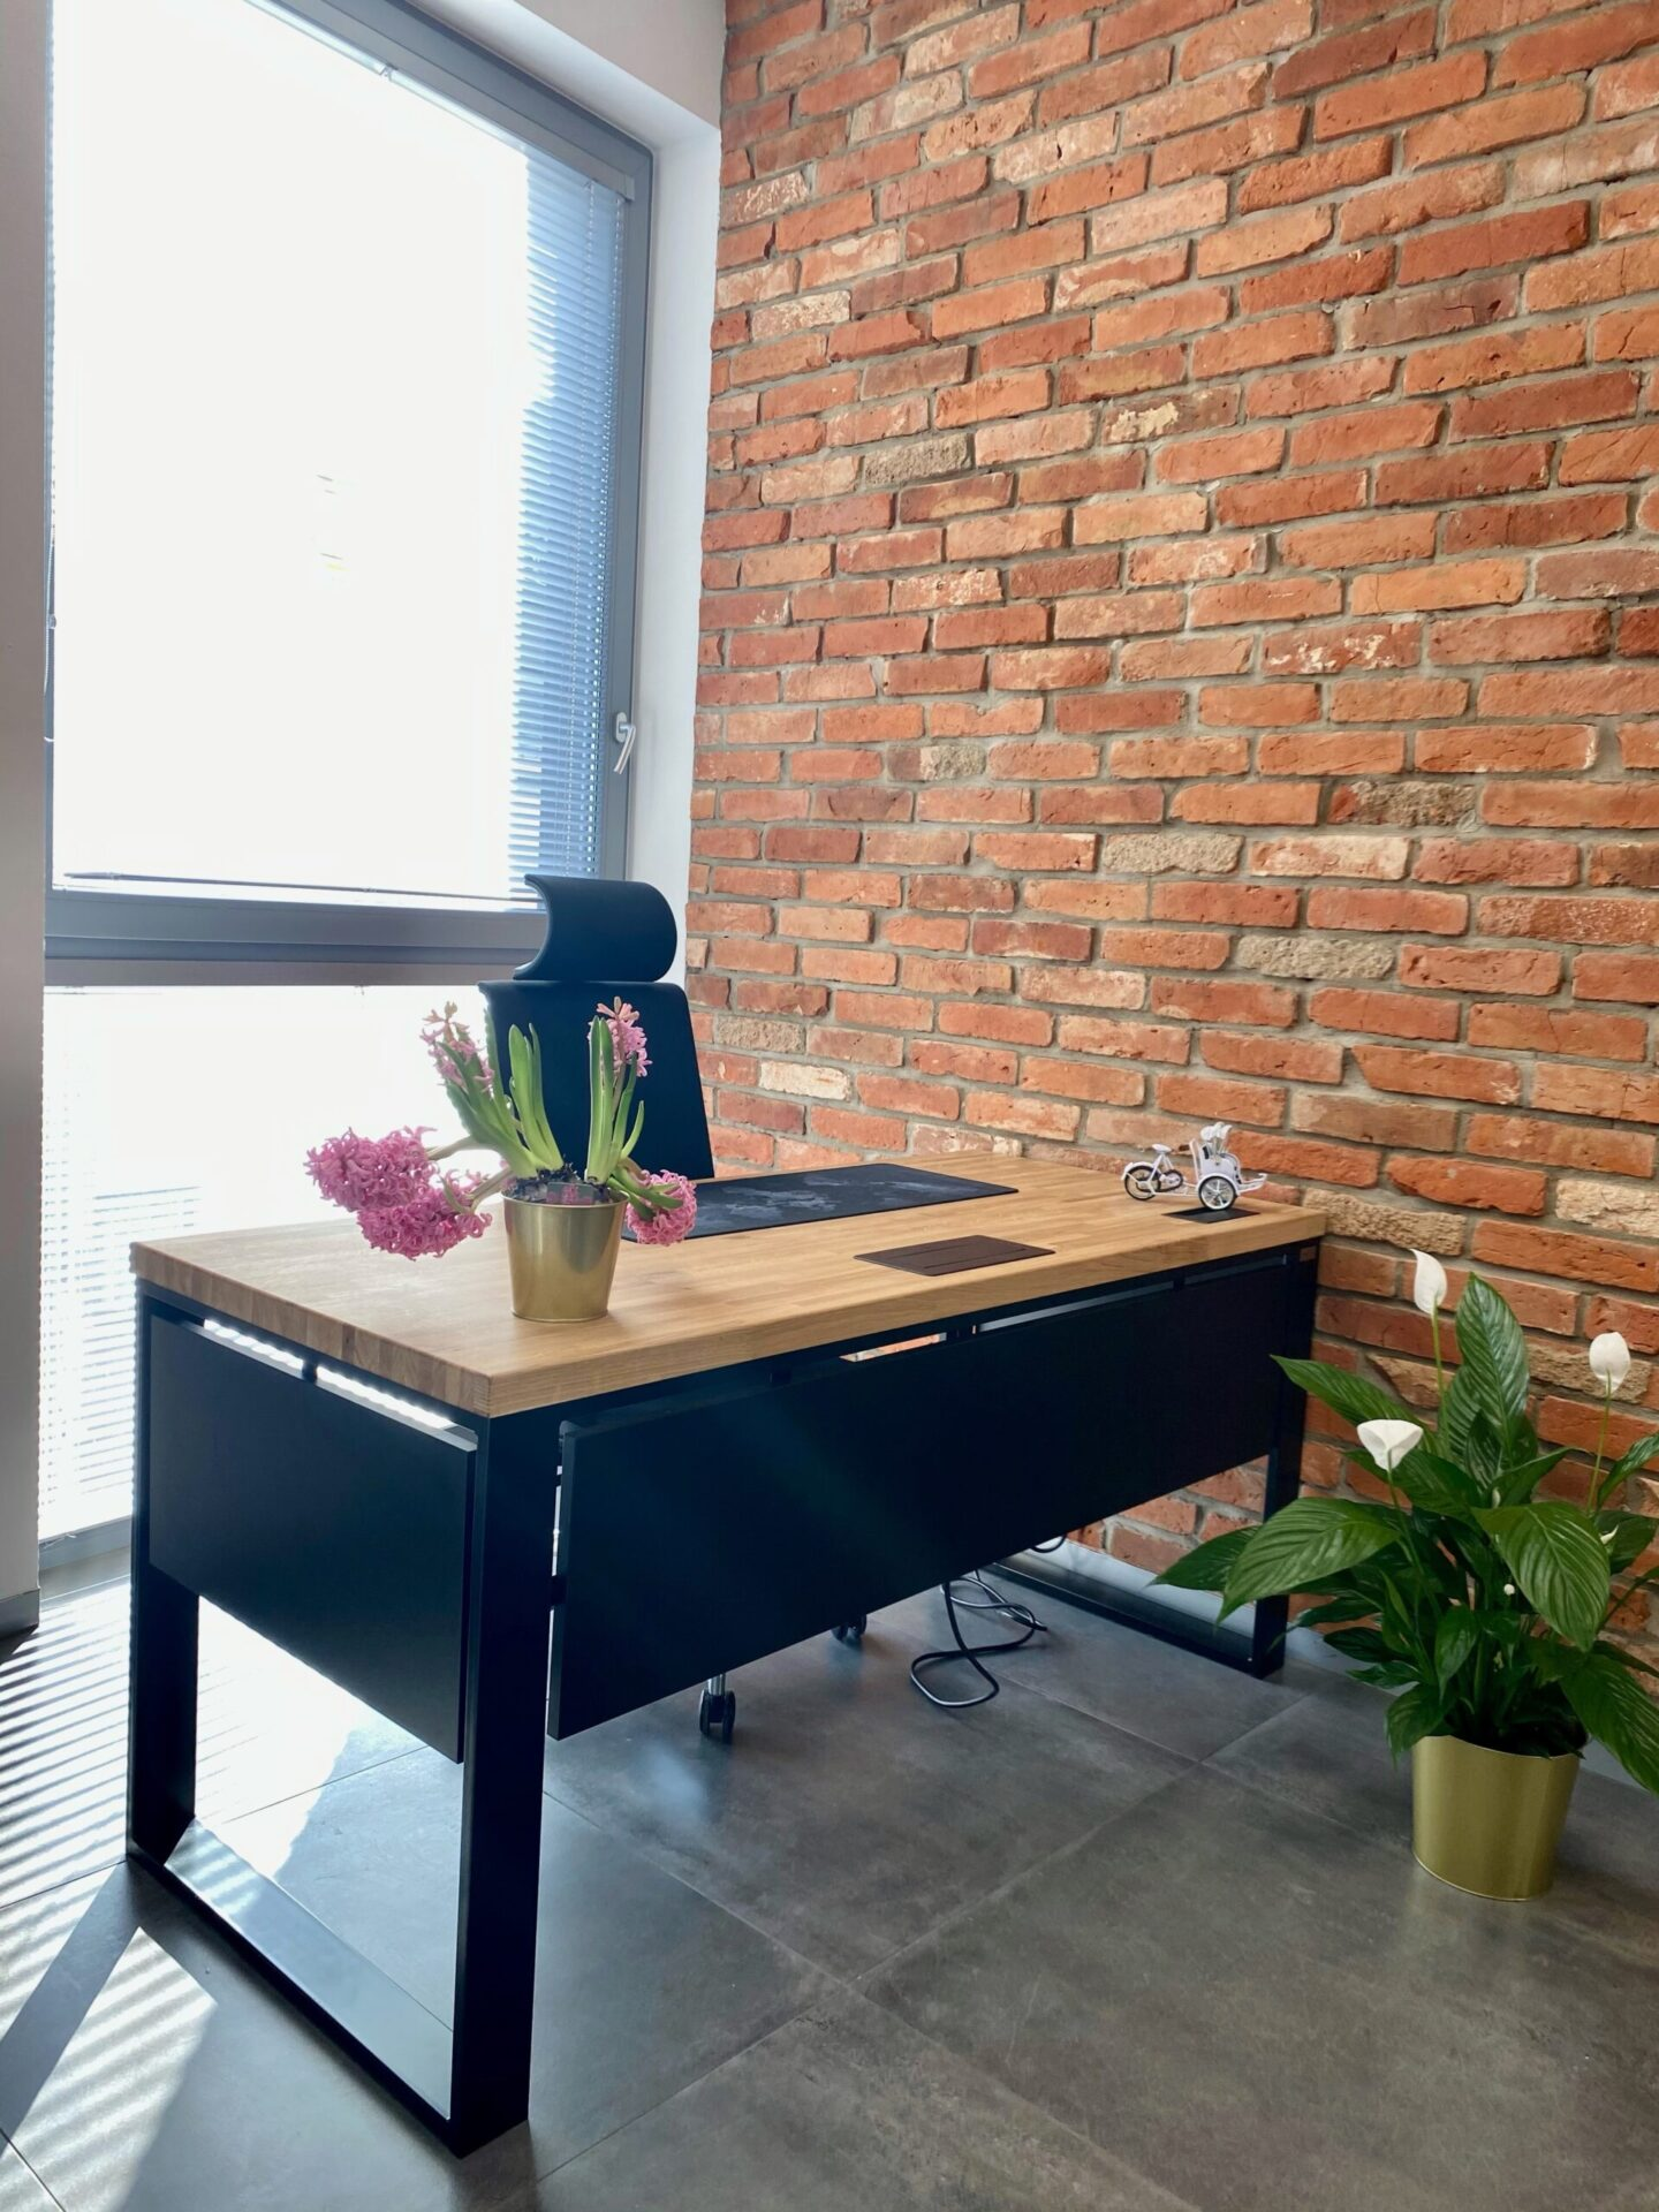 biurko z otworami na kable